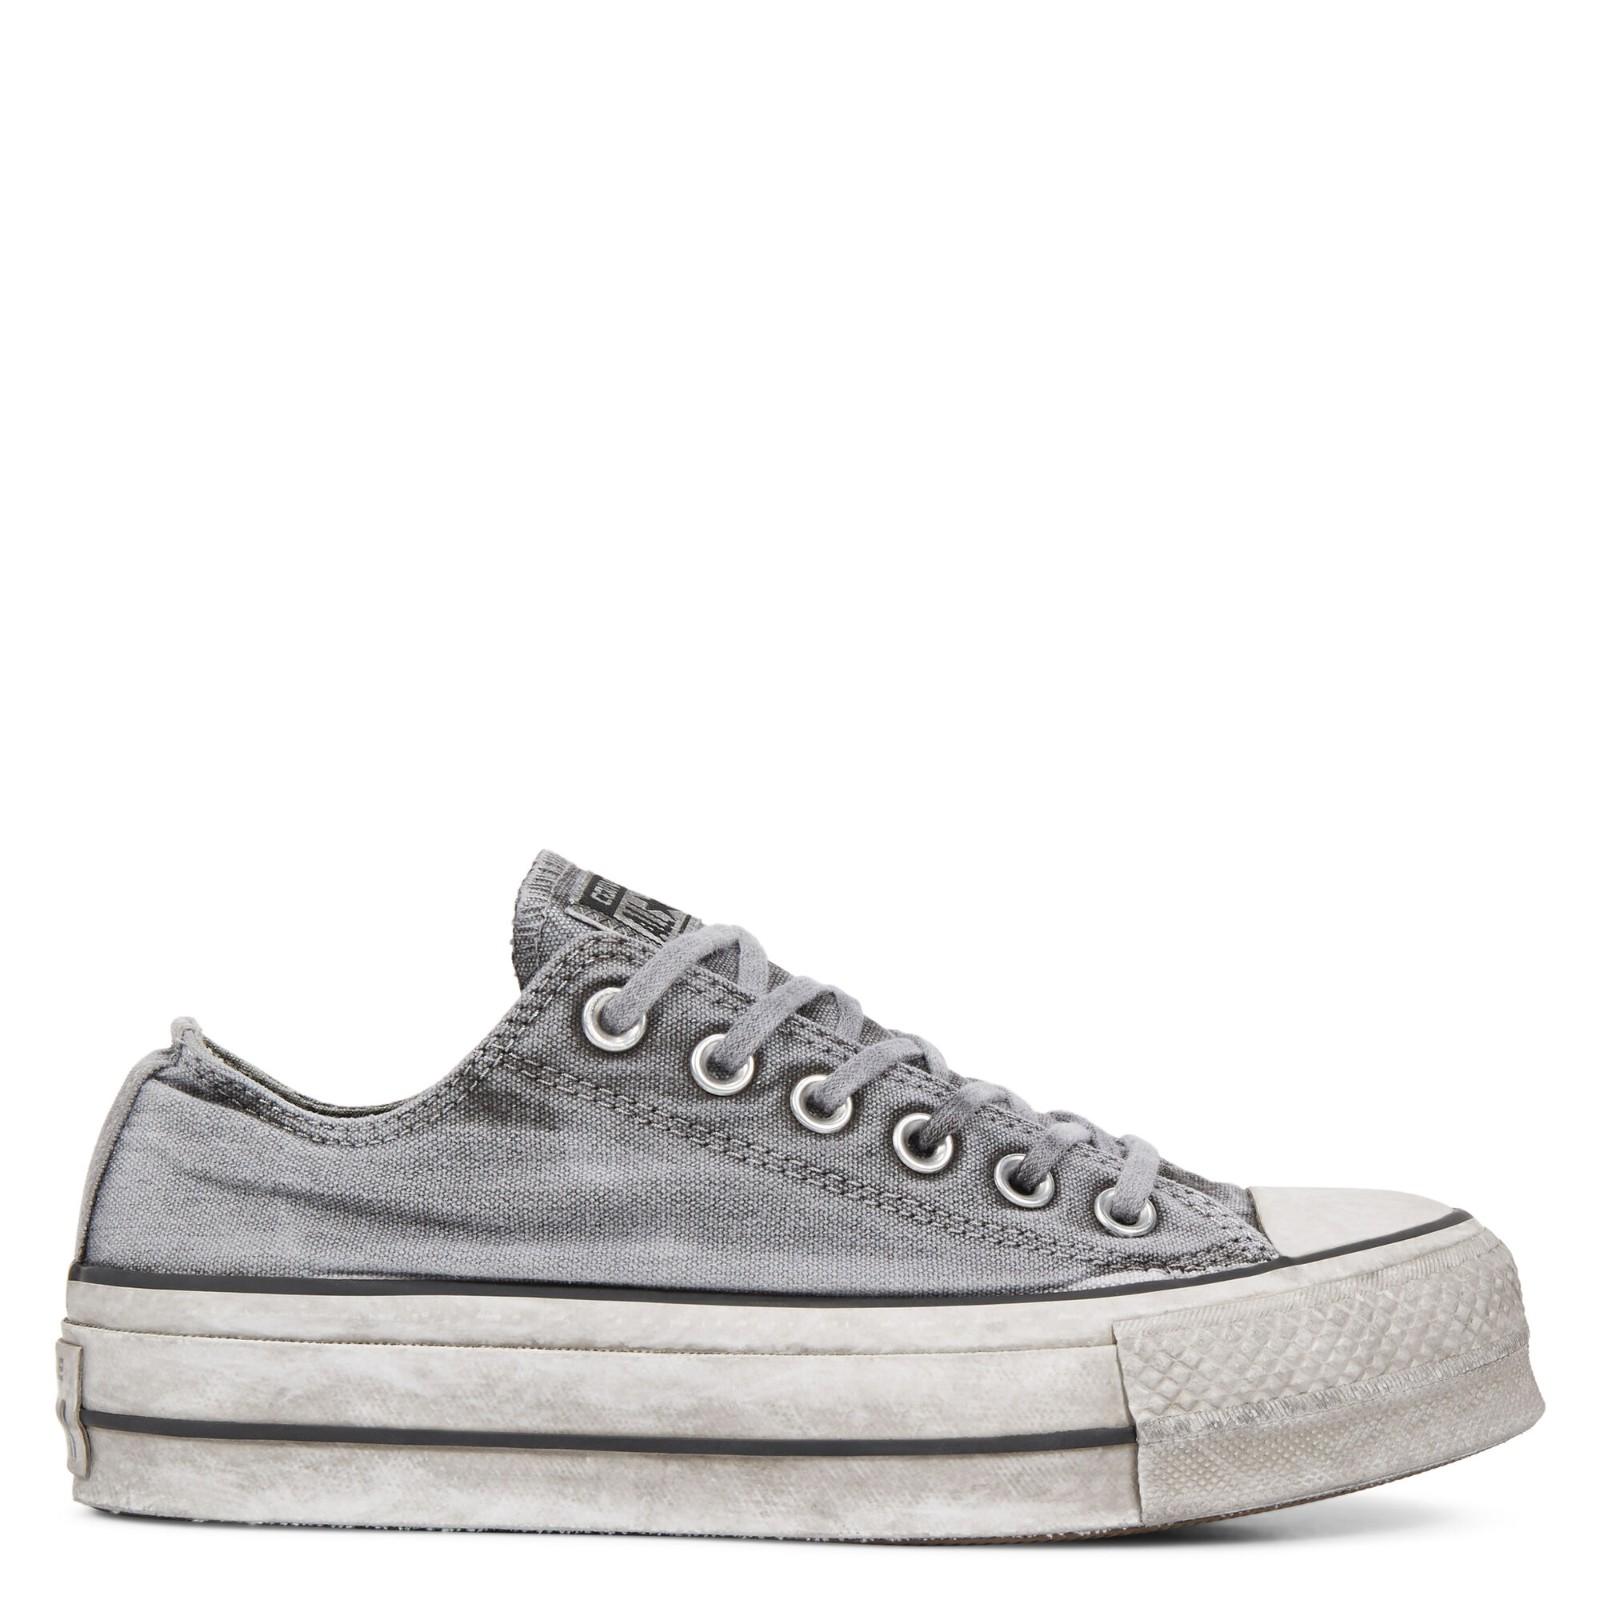 Chuck Taylor All Star Lift Smoked 小脏鞋